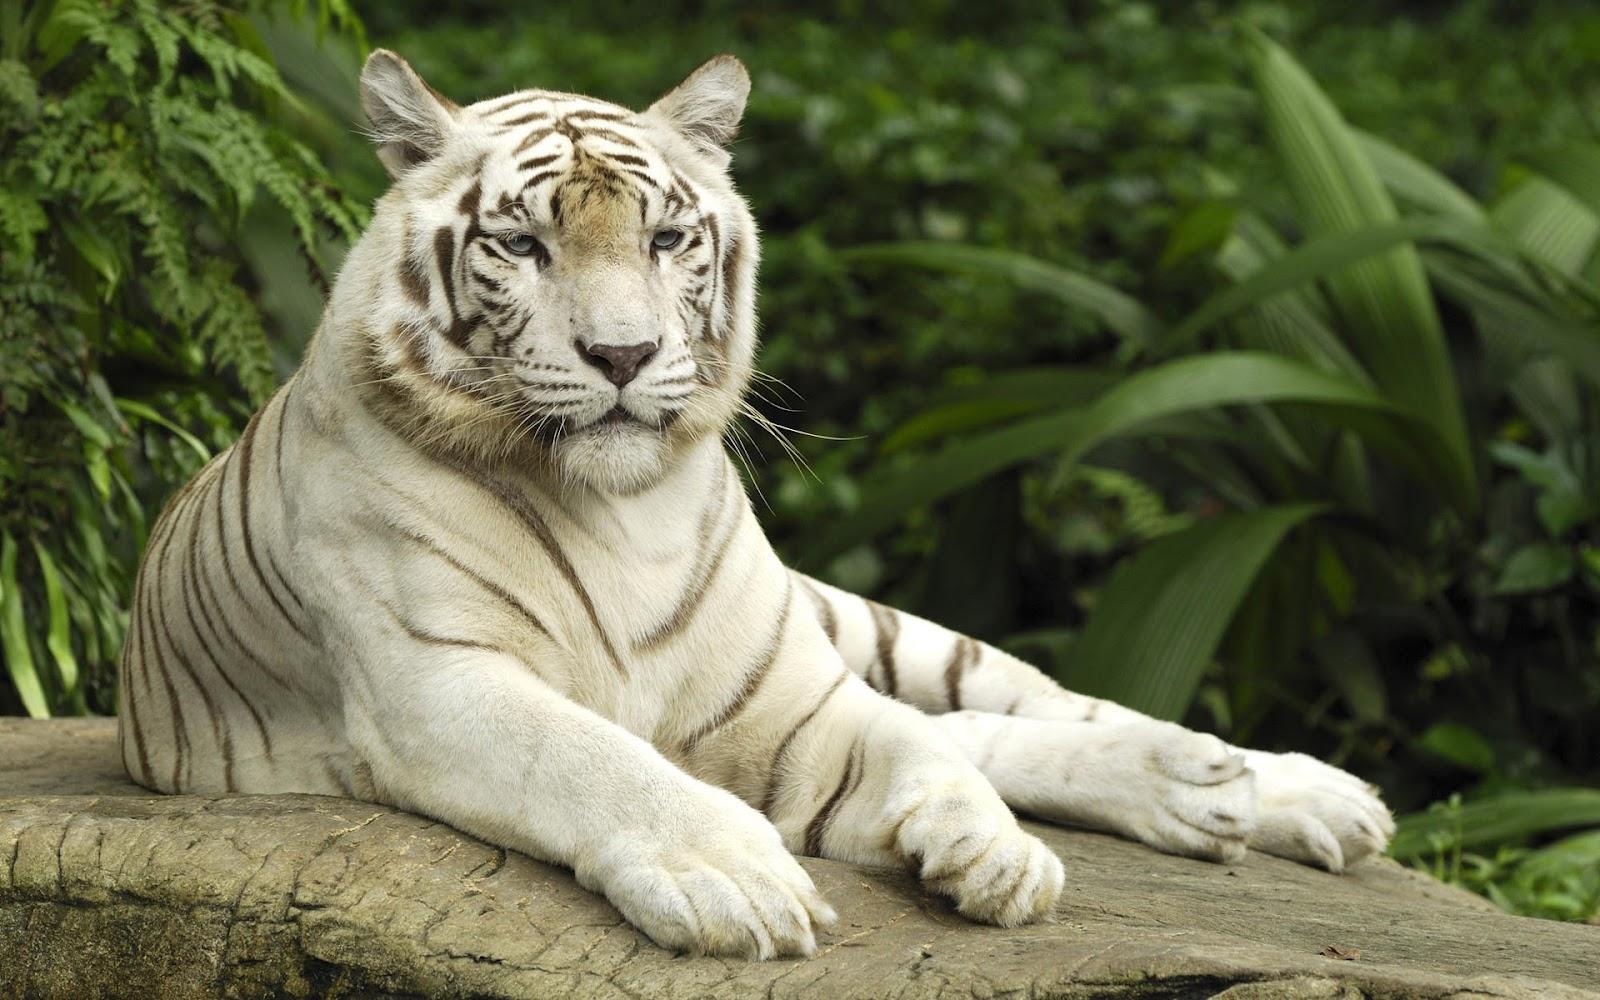 White Tiger Wallpaper 1080p Beautiful 1080p HD Tig...